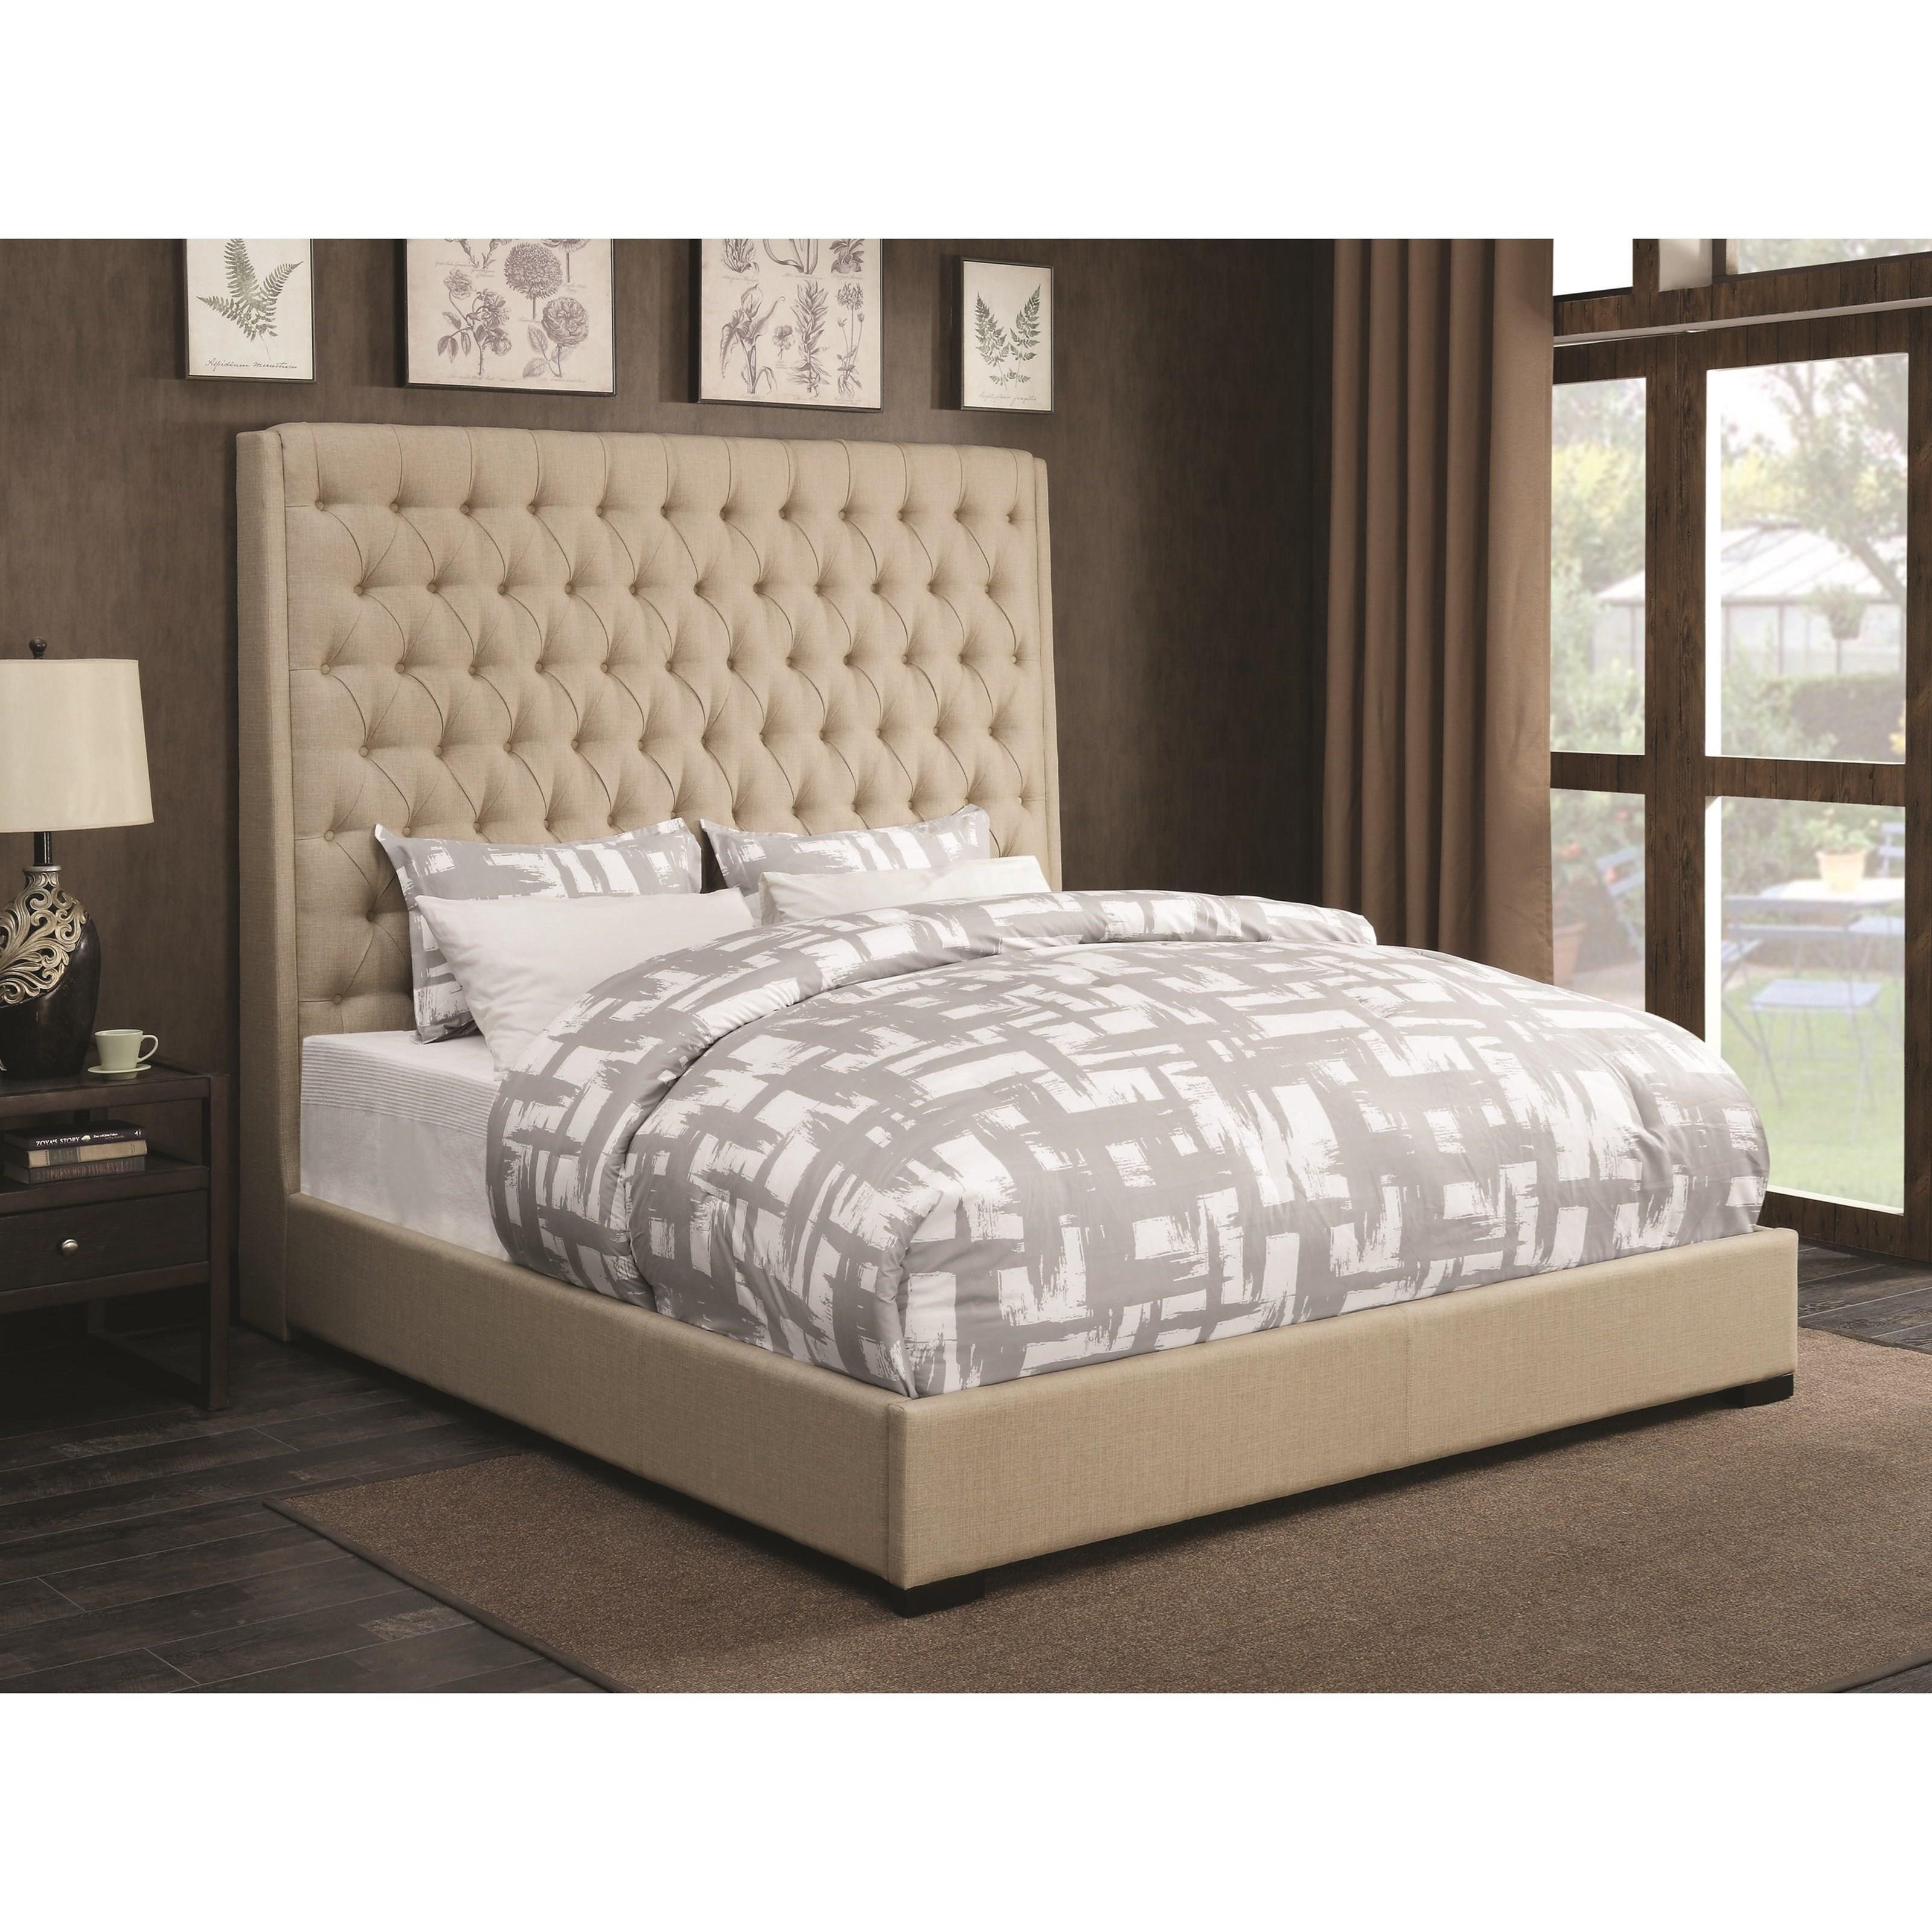 Upholstered Beds Cal King Bed by Coaster at Carolina Direct